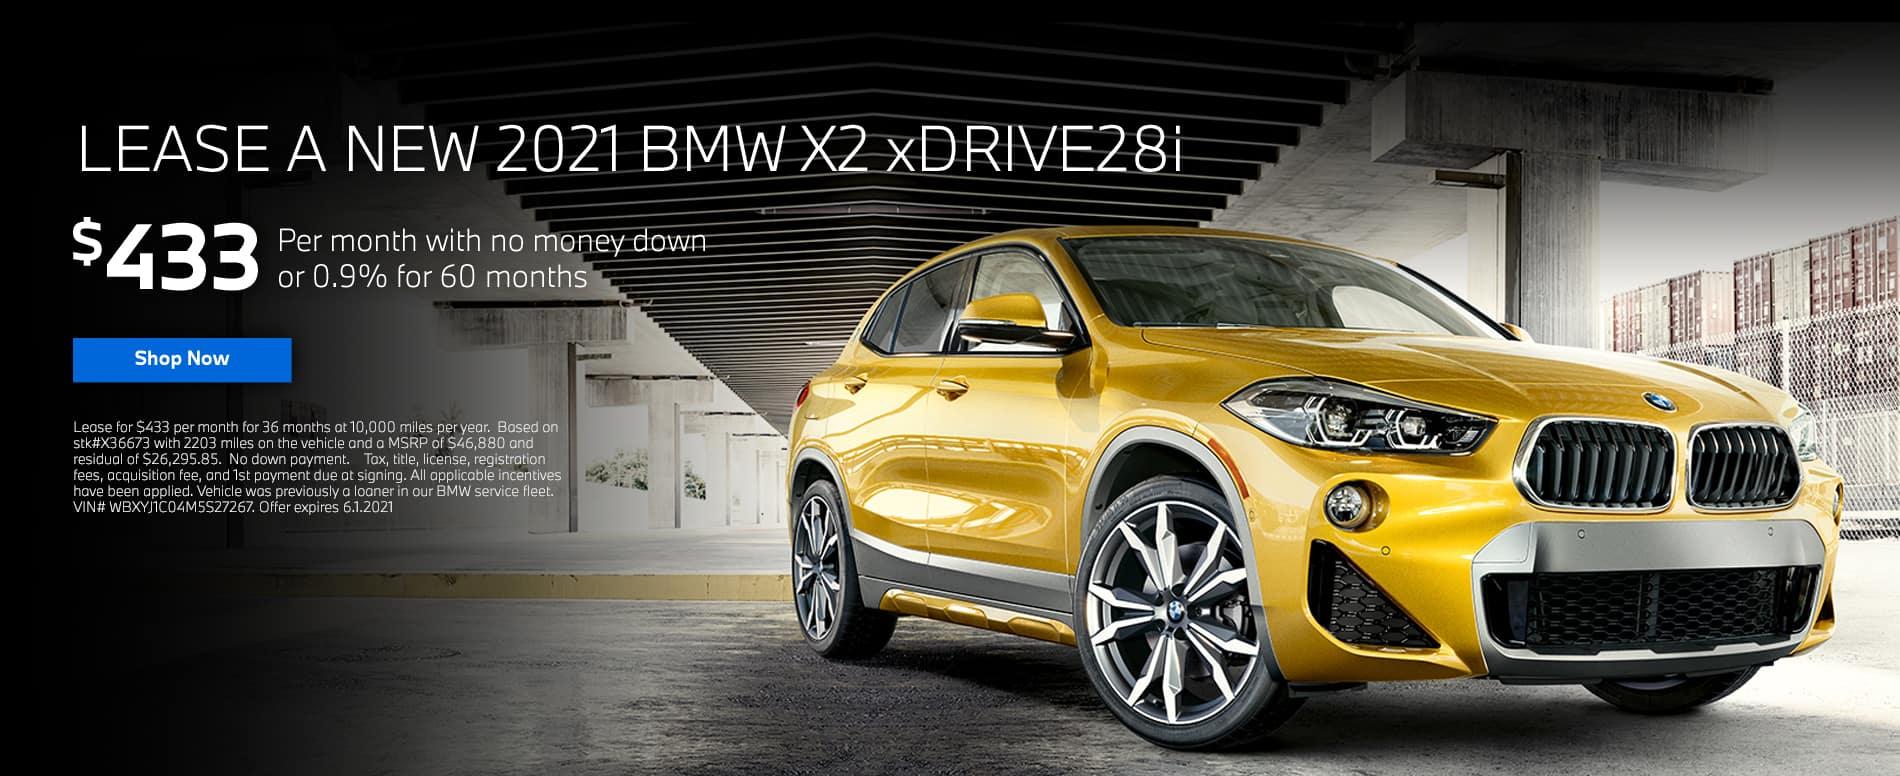 Bill Jacobs BMW X2